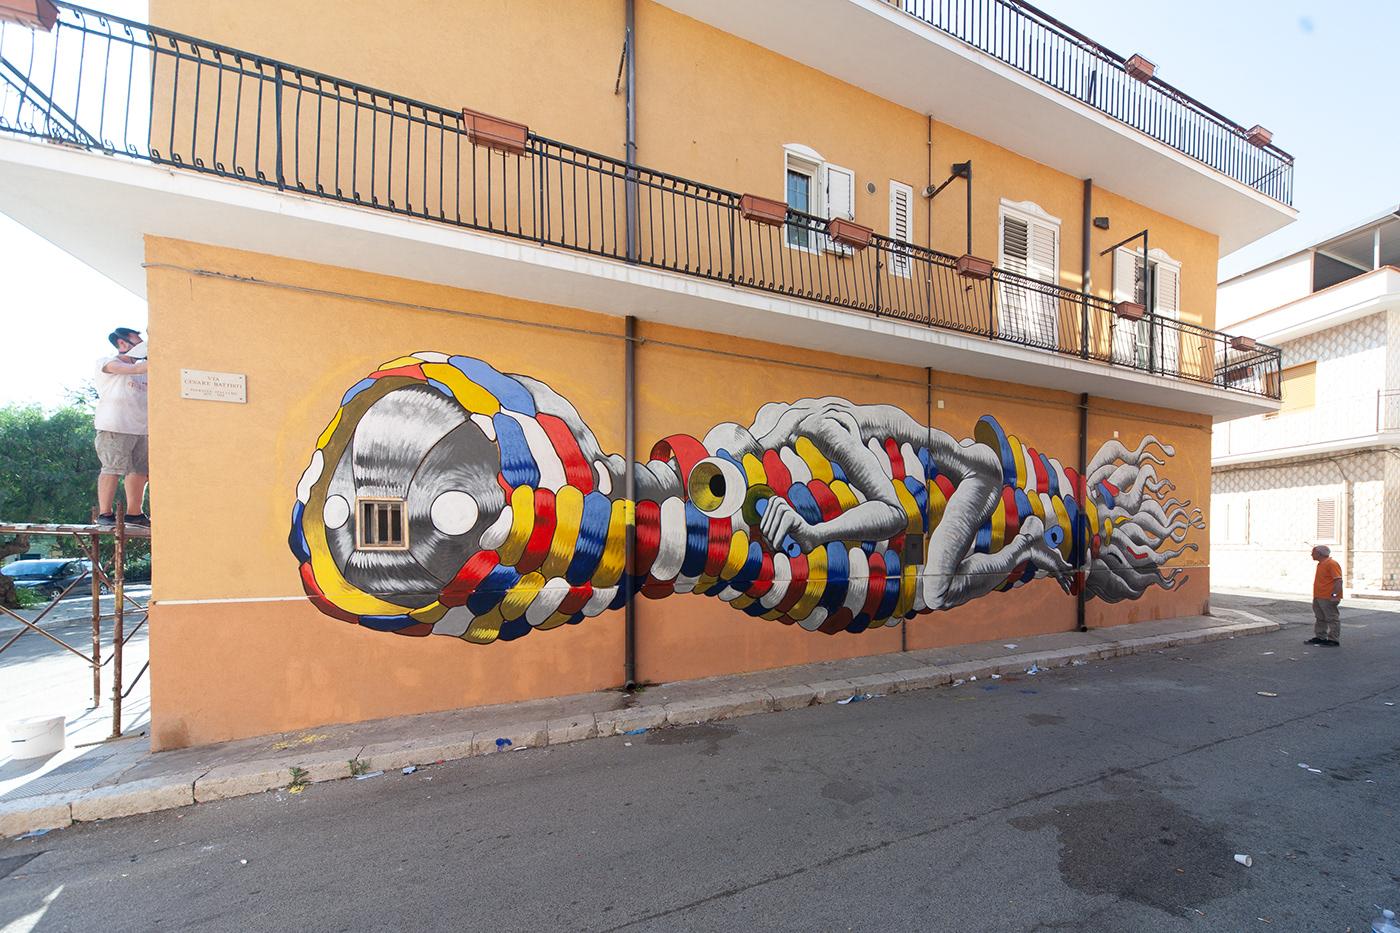 Image may contain: outdoor and graffiti